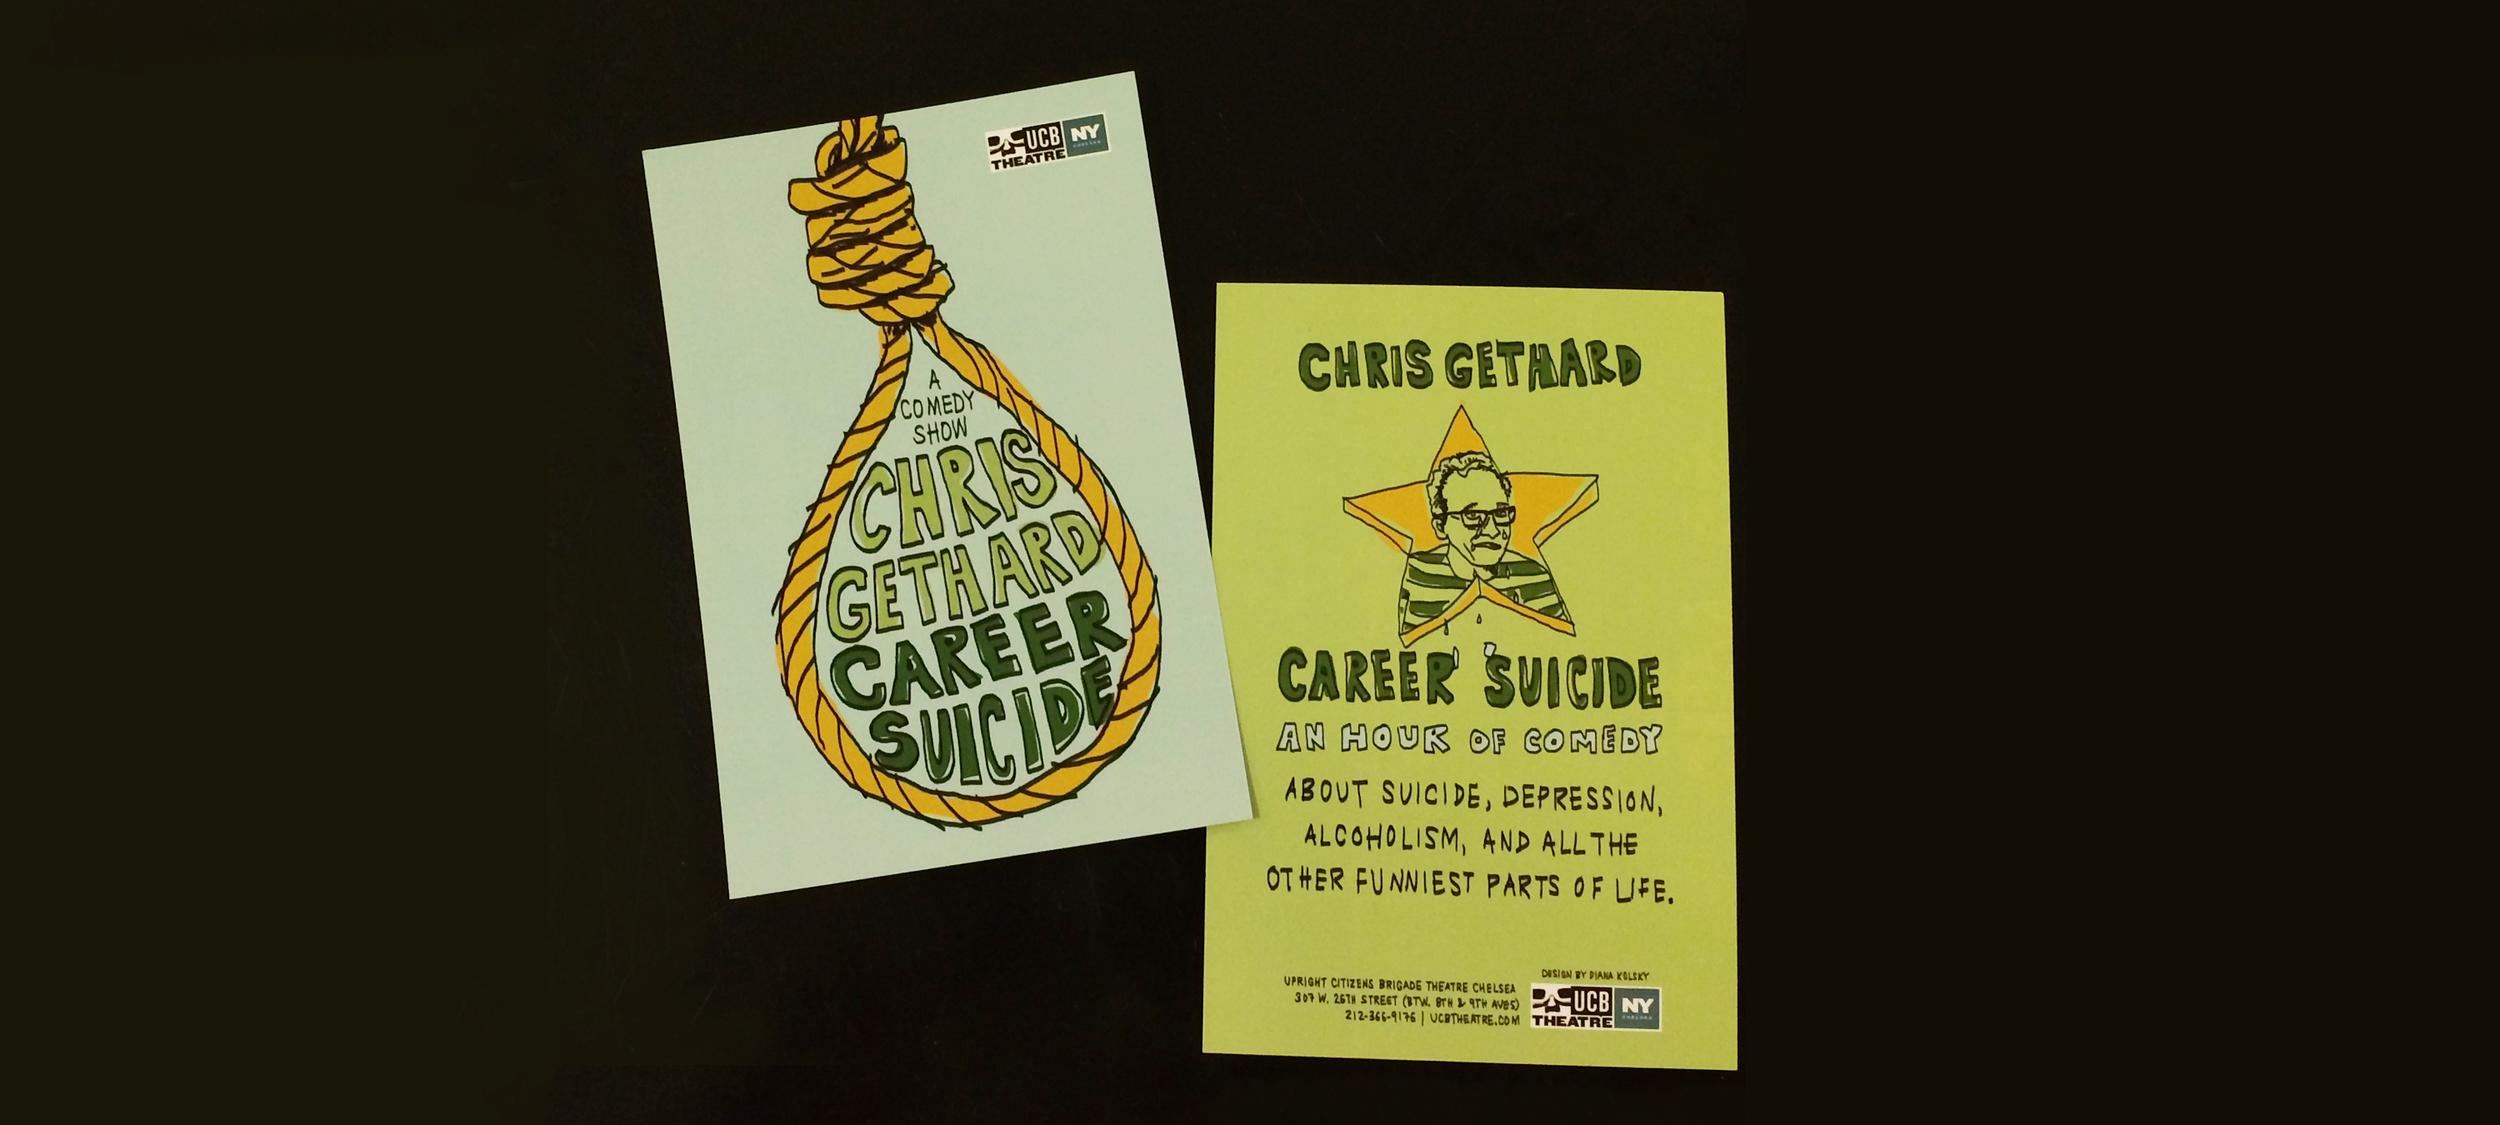 Career Suicide     A Comedy Show